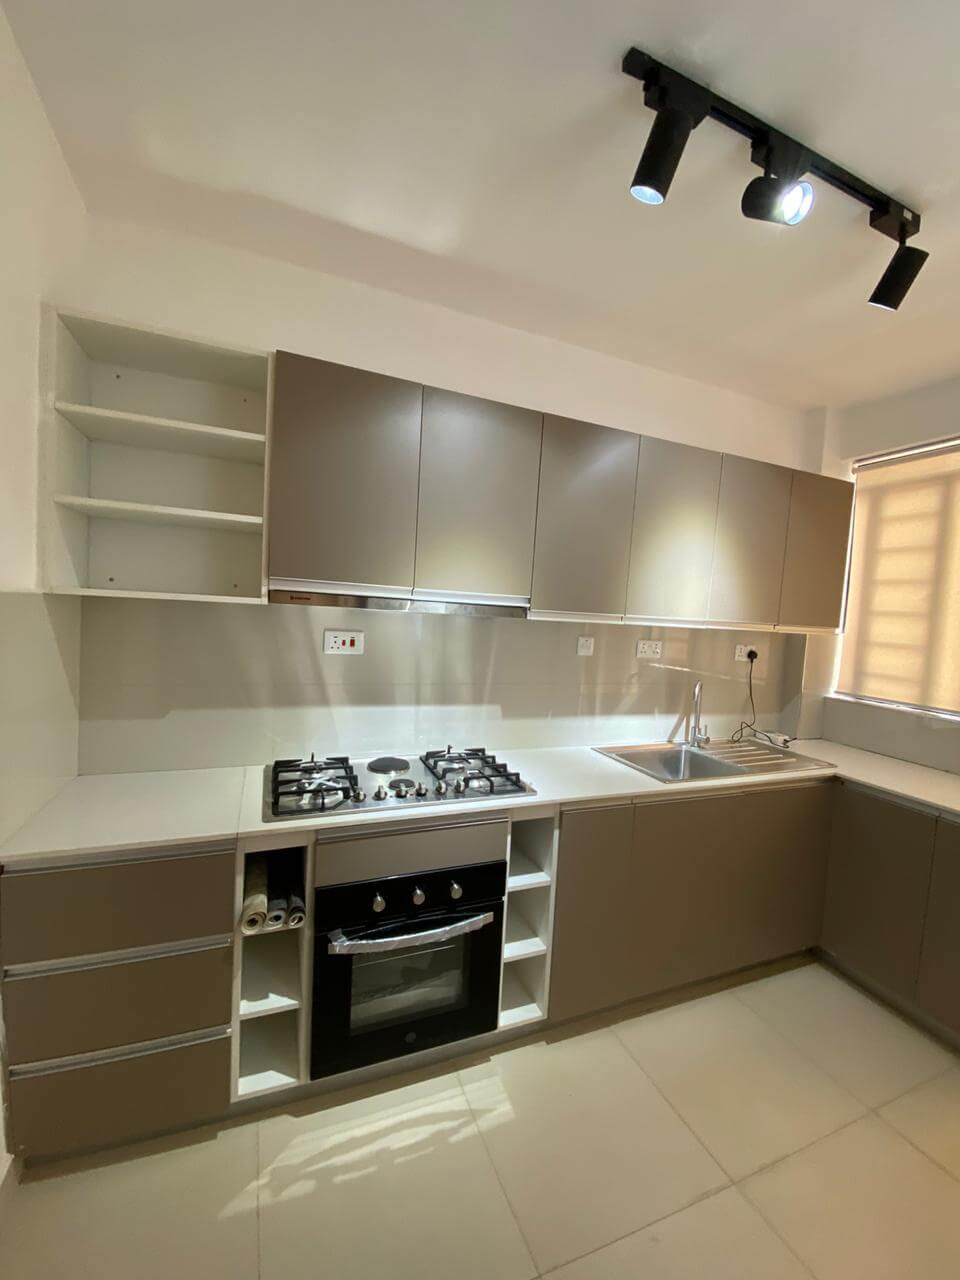 grandville luxury apartments phase 2 kitchen